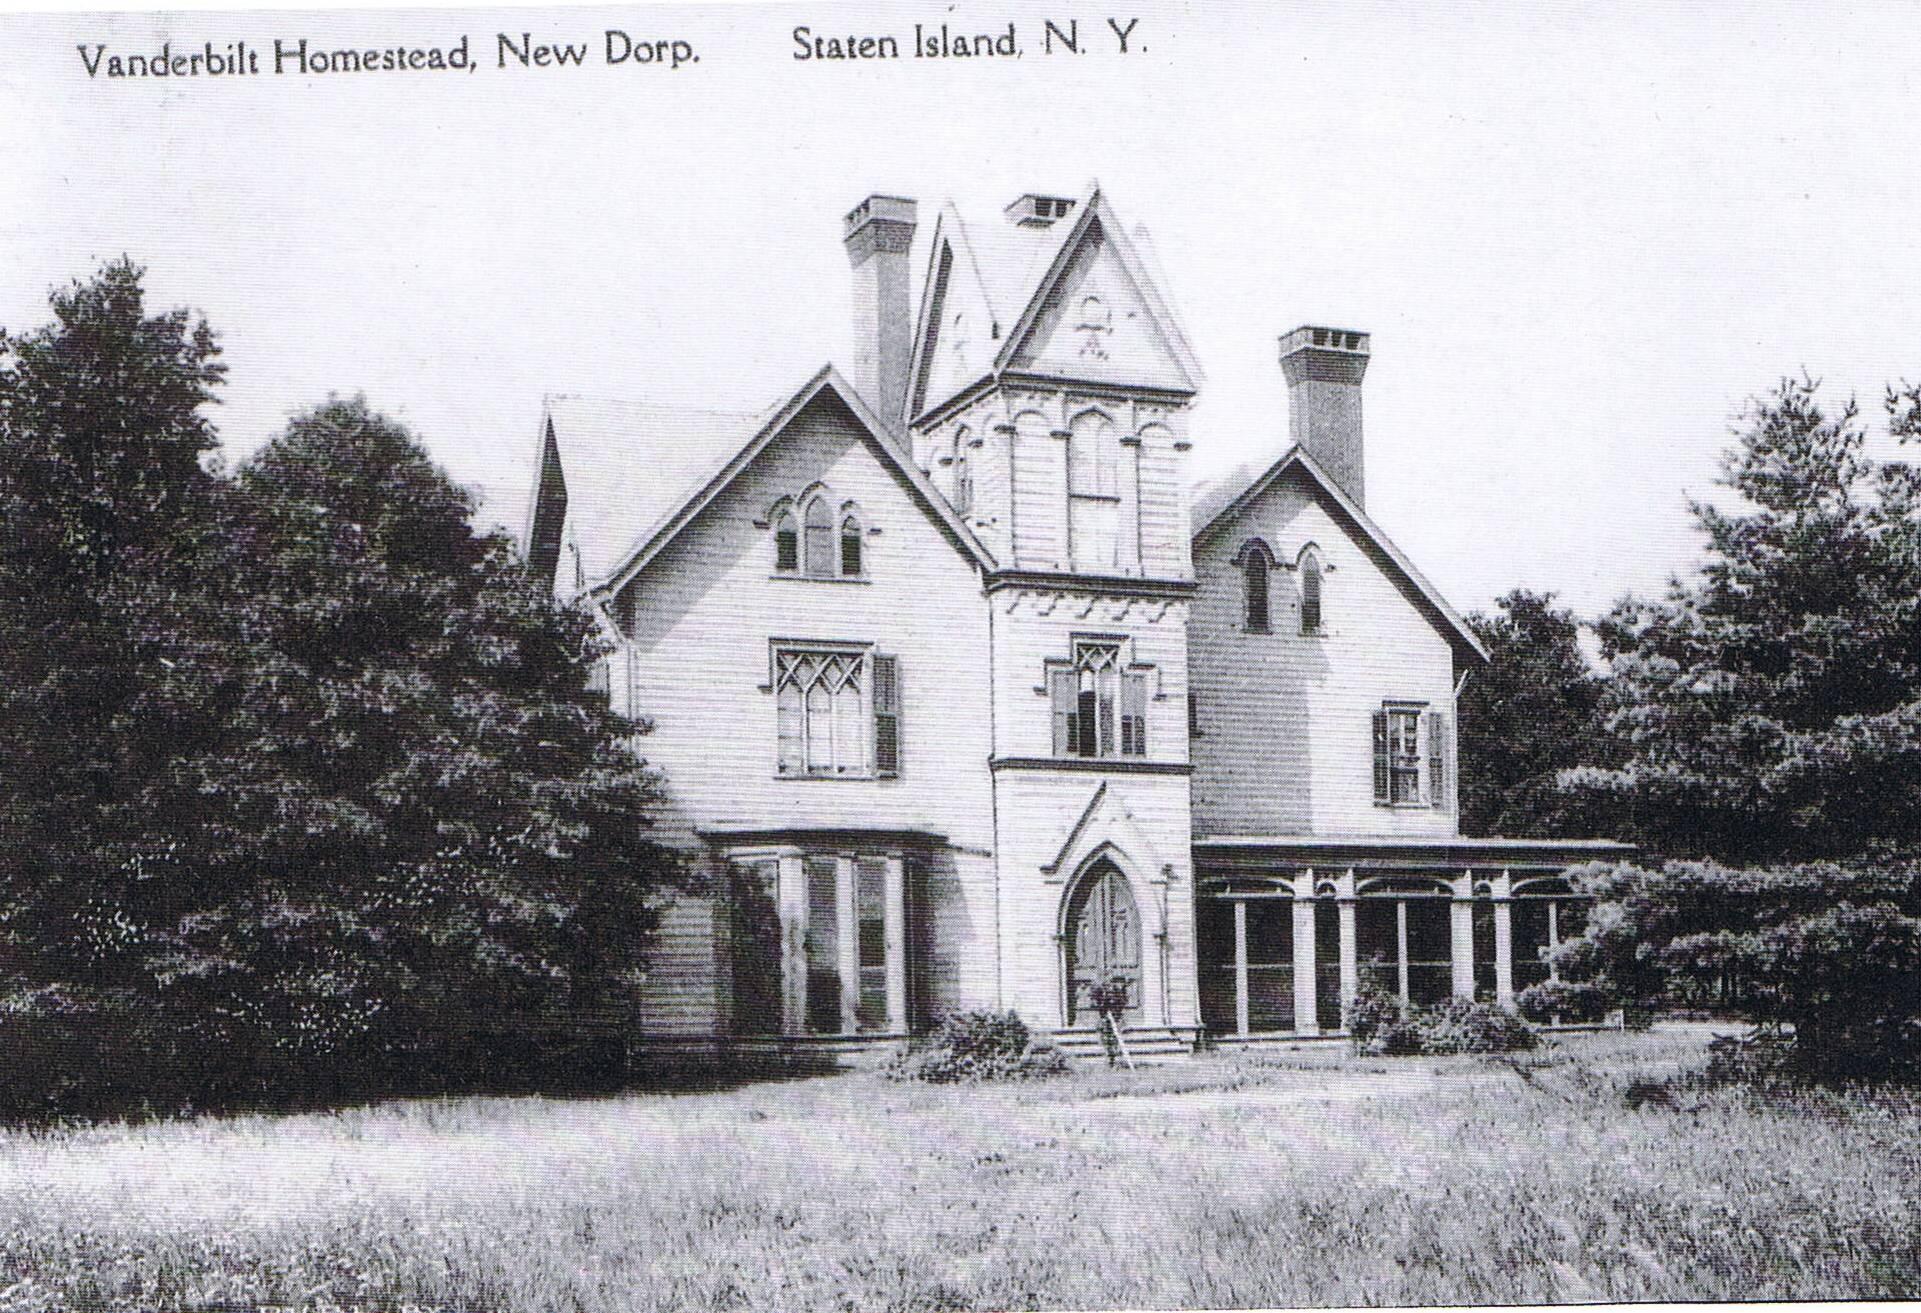 Staten Island Summer Film Review